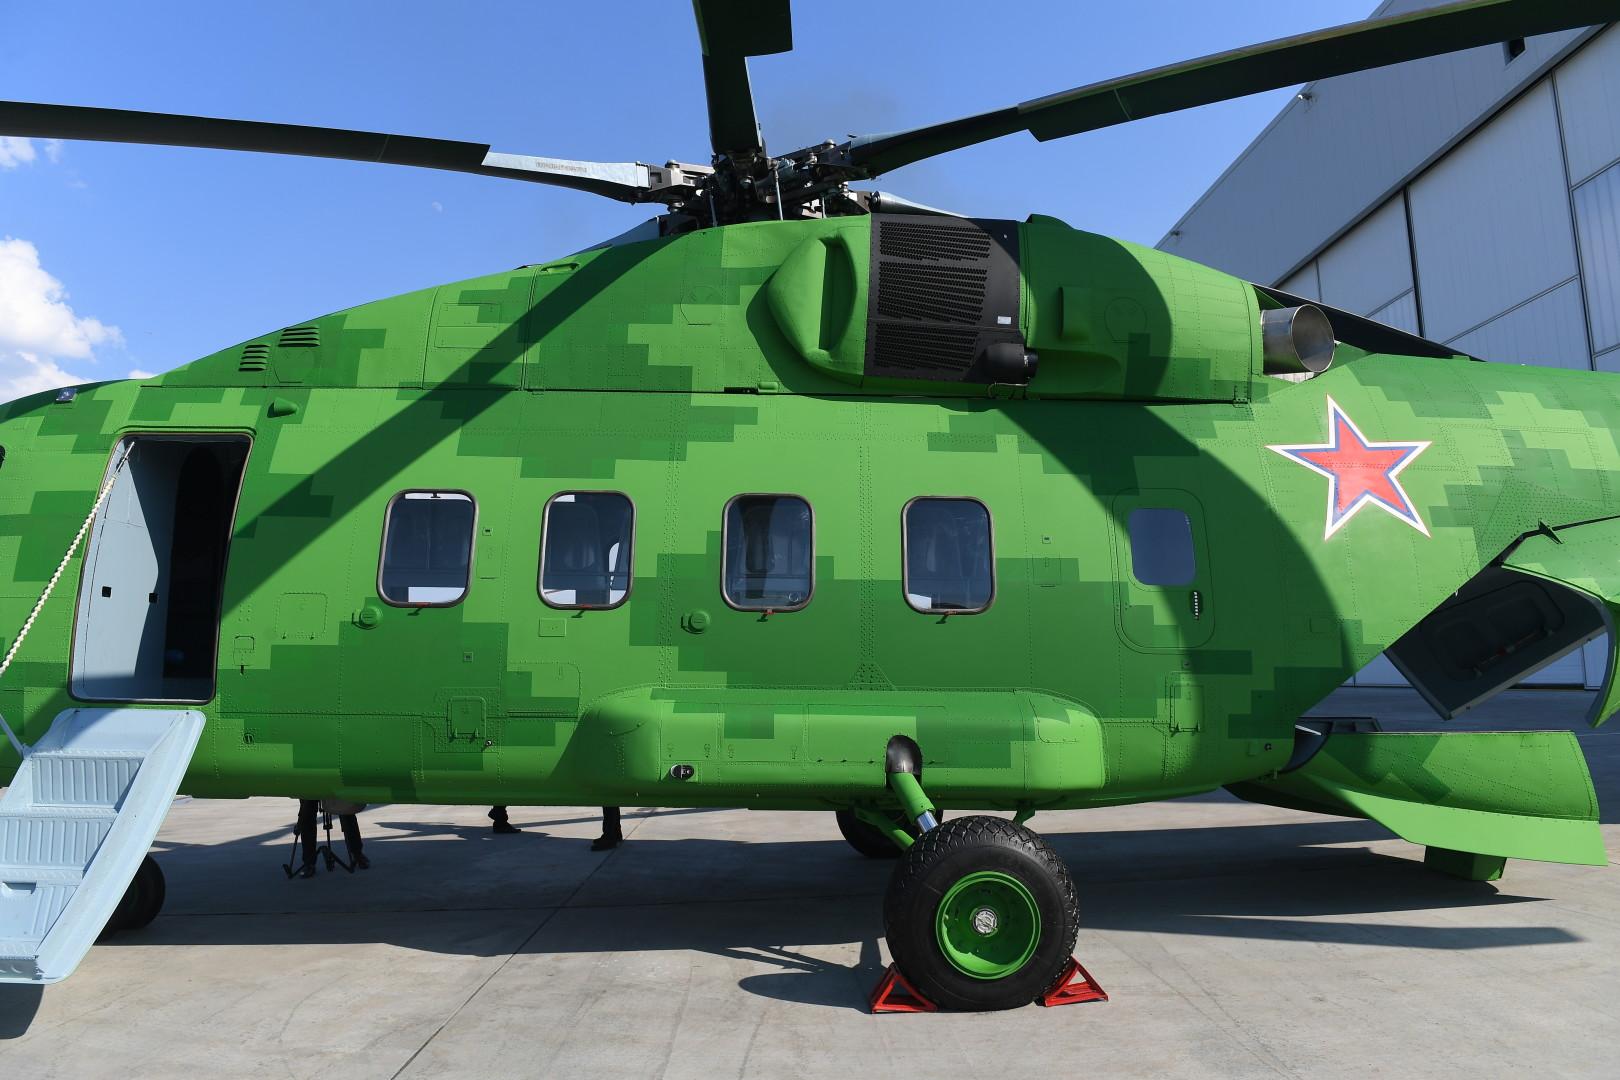 Mi-8/17, Μi-38, Mi-26: News - Page 11 IsGNJgzliic